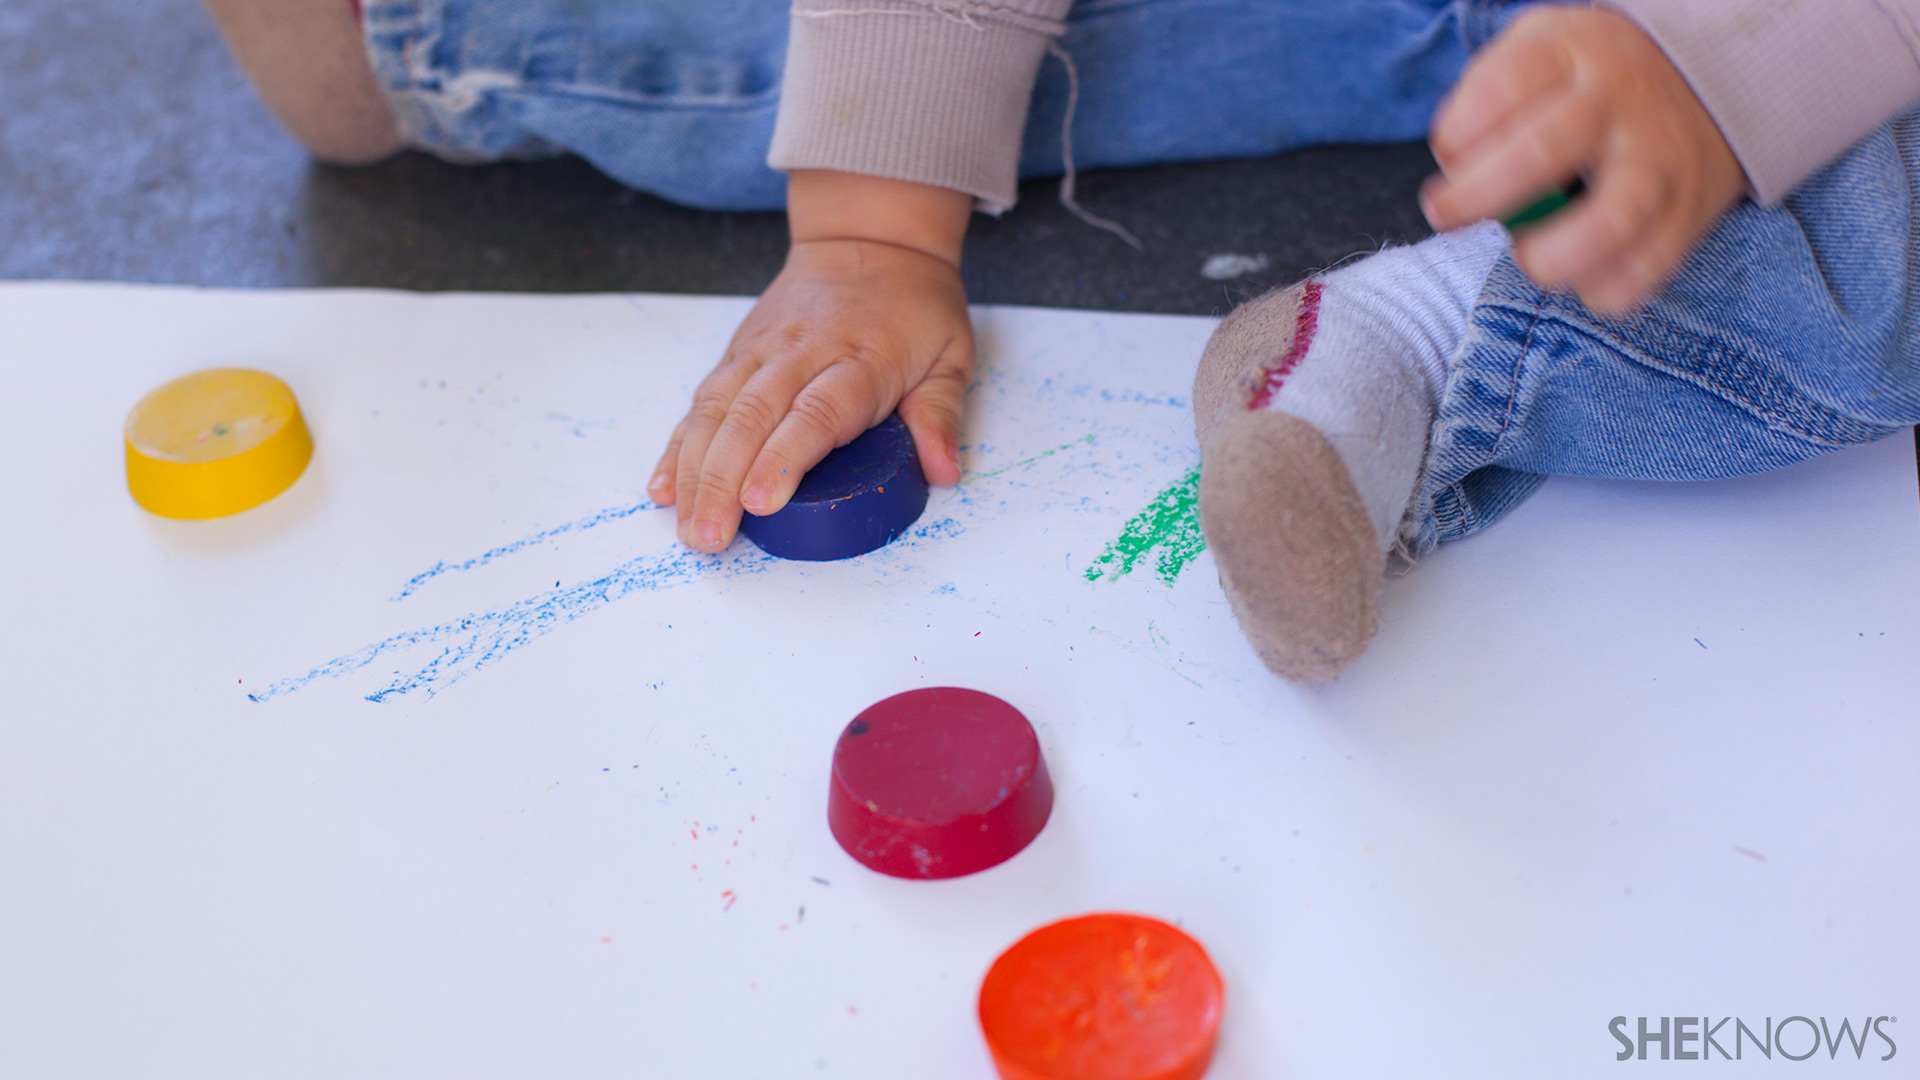 Toddler crayon   Sheknows.com - Color time